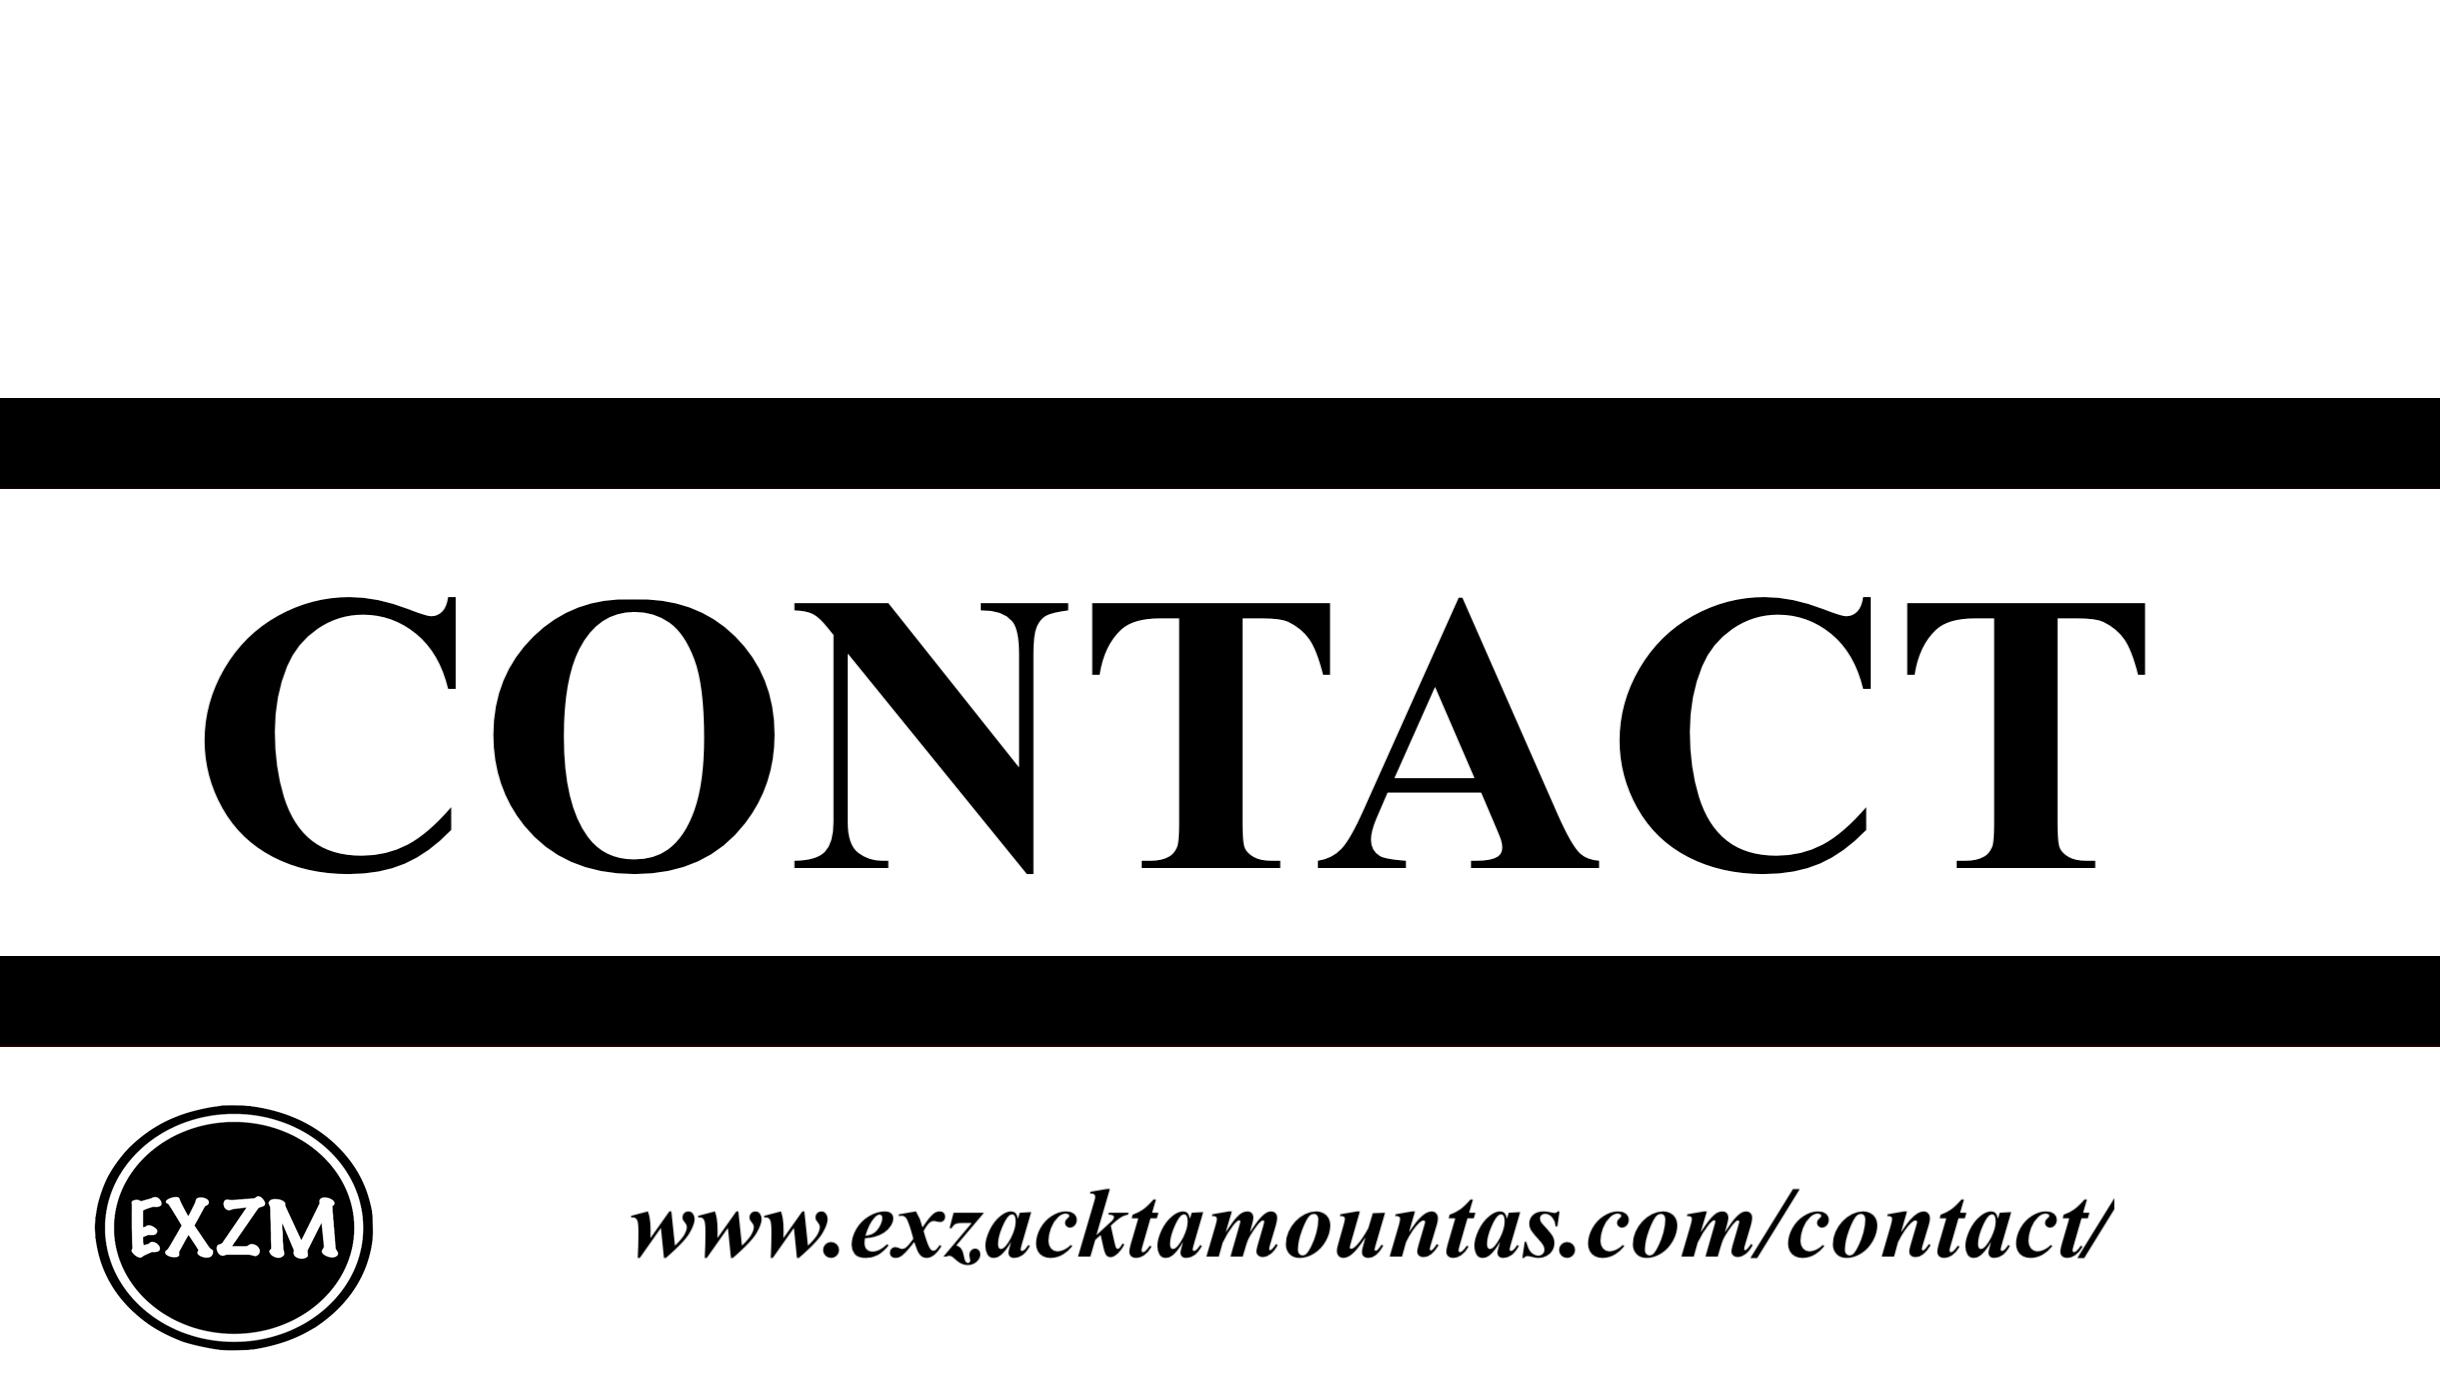 Contact EXZM 10 8 2019